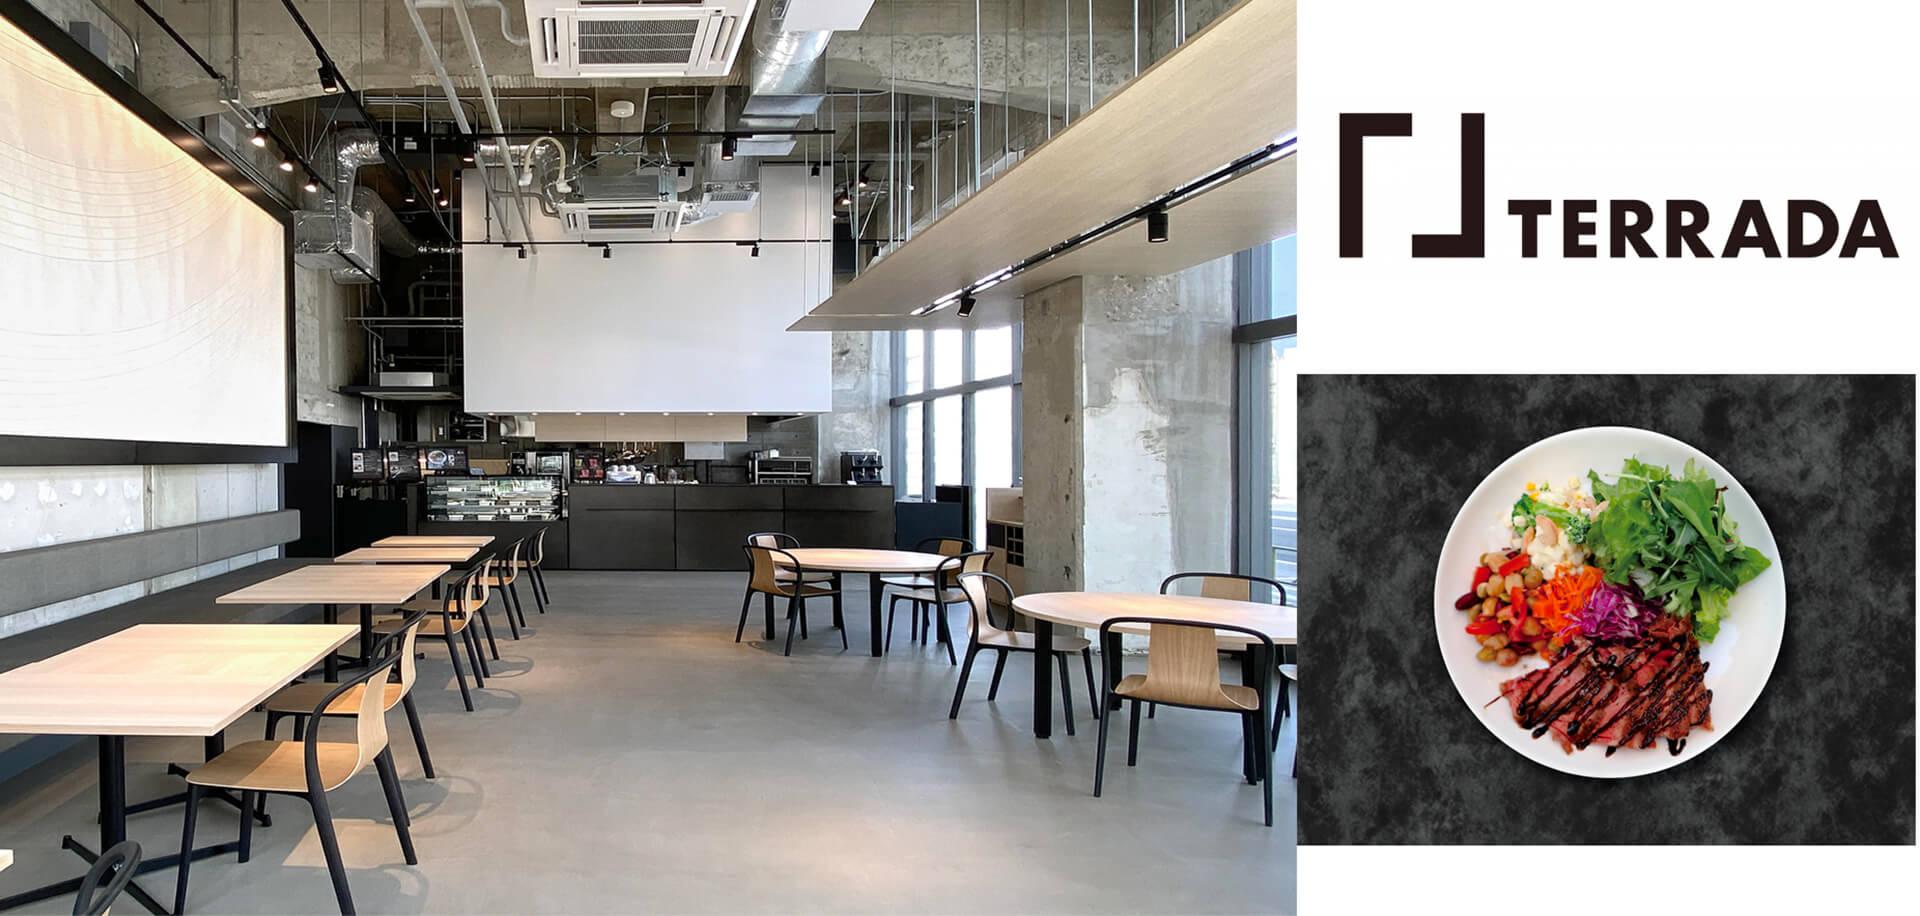 寺田倉庫「TERRADA ART COMPLEX CAFE」